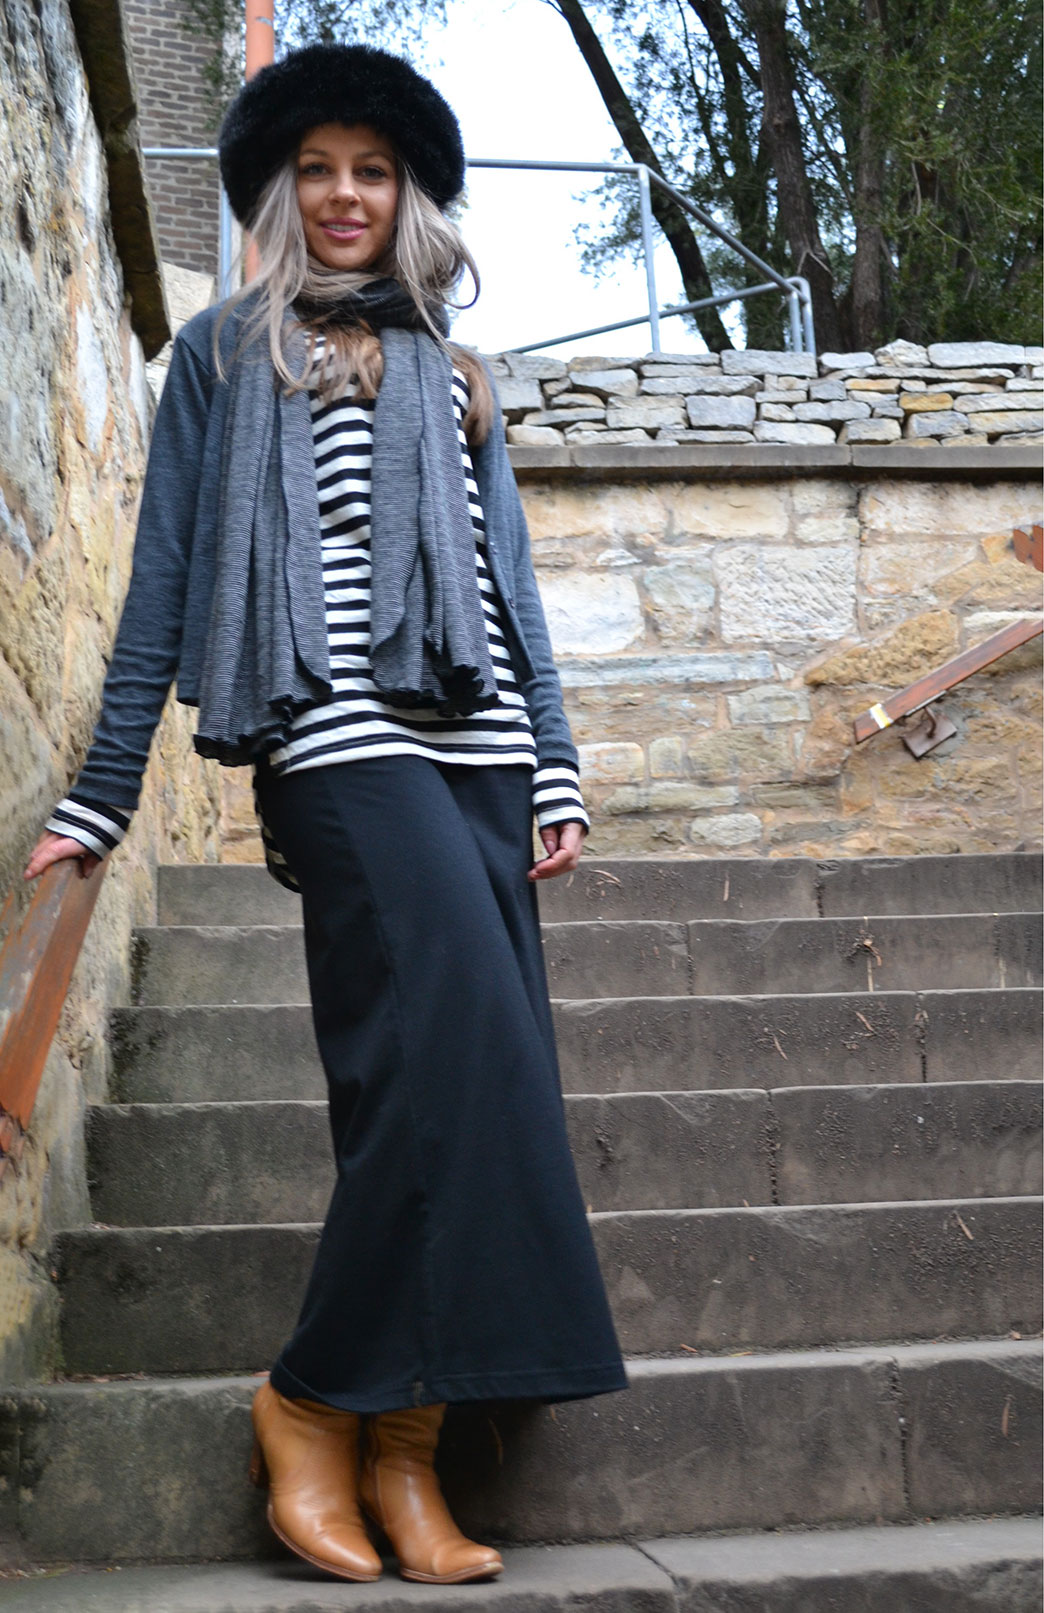 Maxi Skirt - Women's Black Merino Wool Long Maxi Skirt - Smitten Merino Tasmania Australia